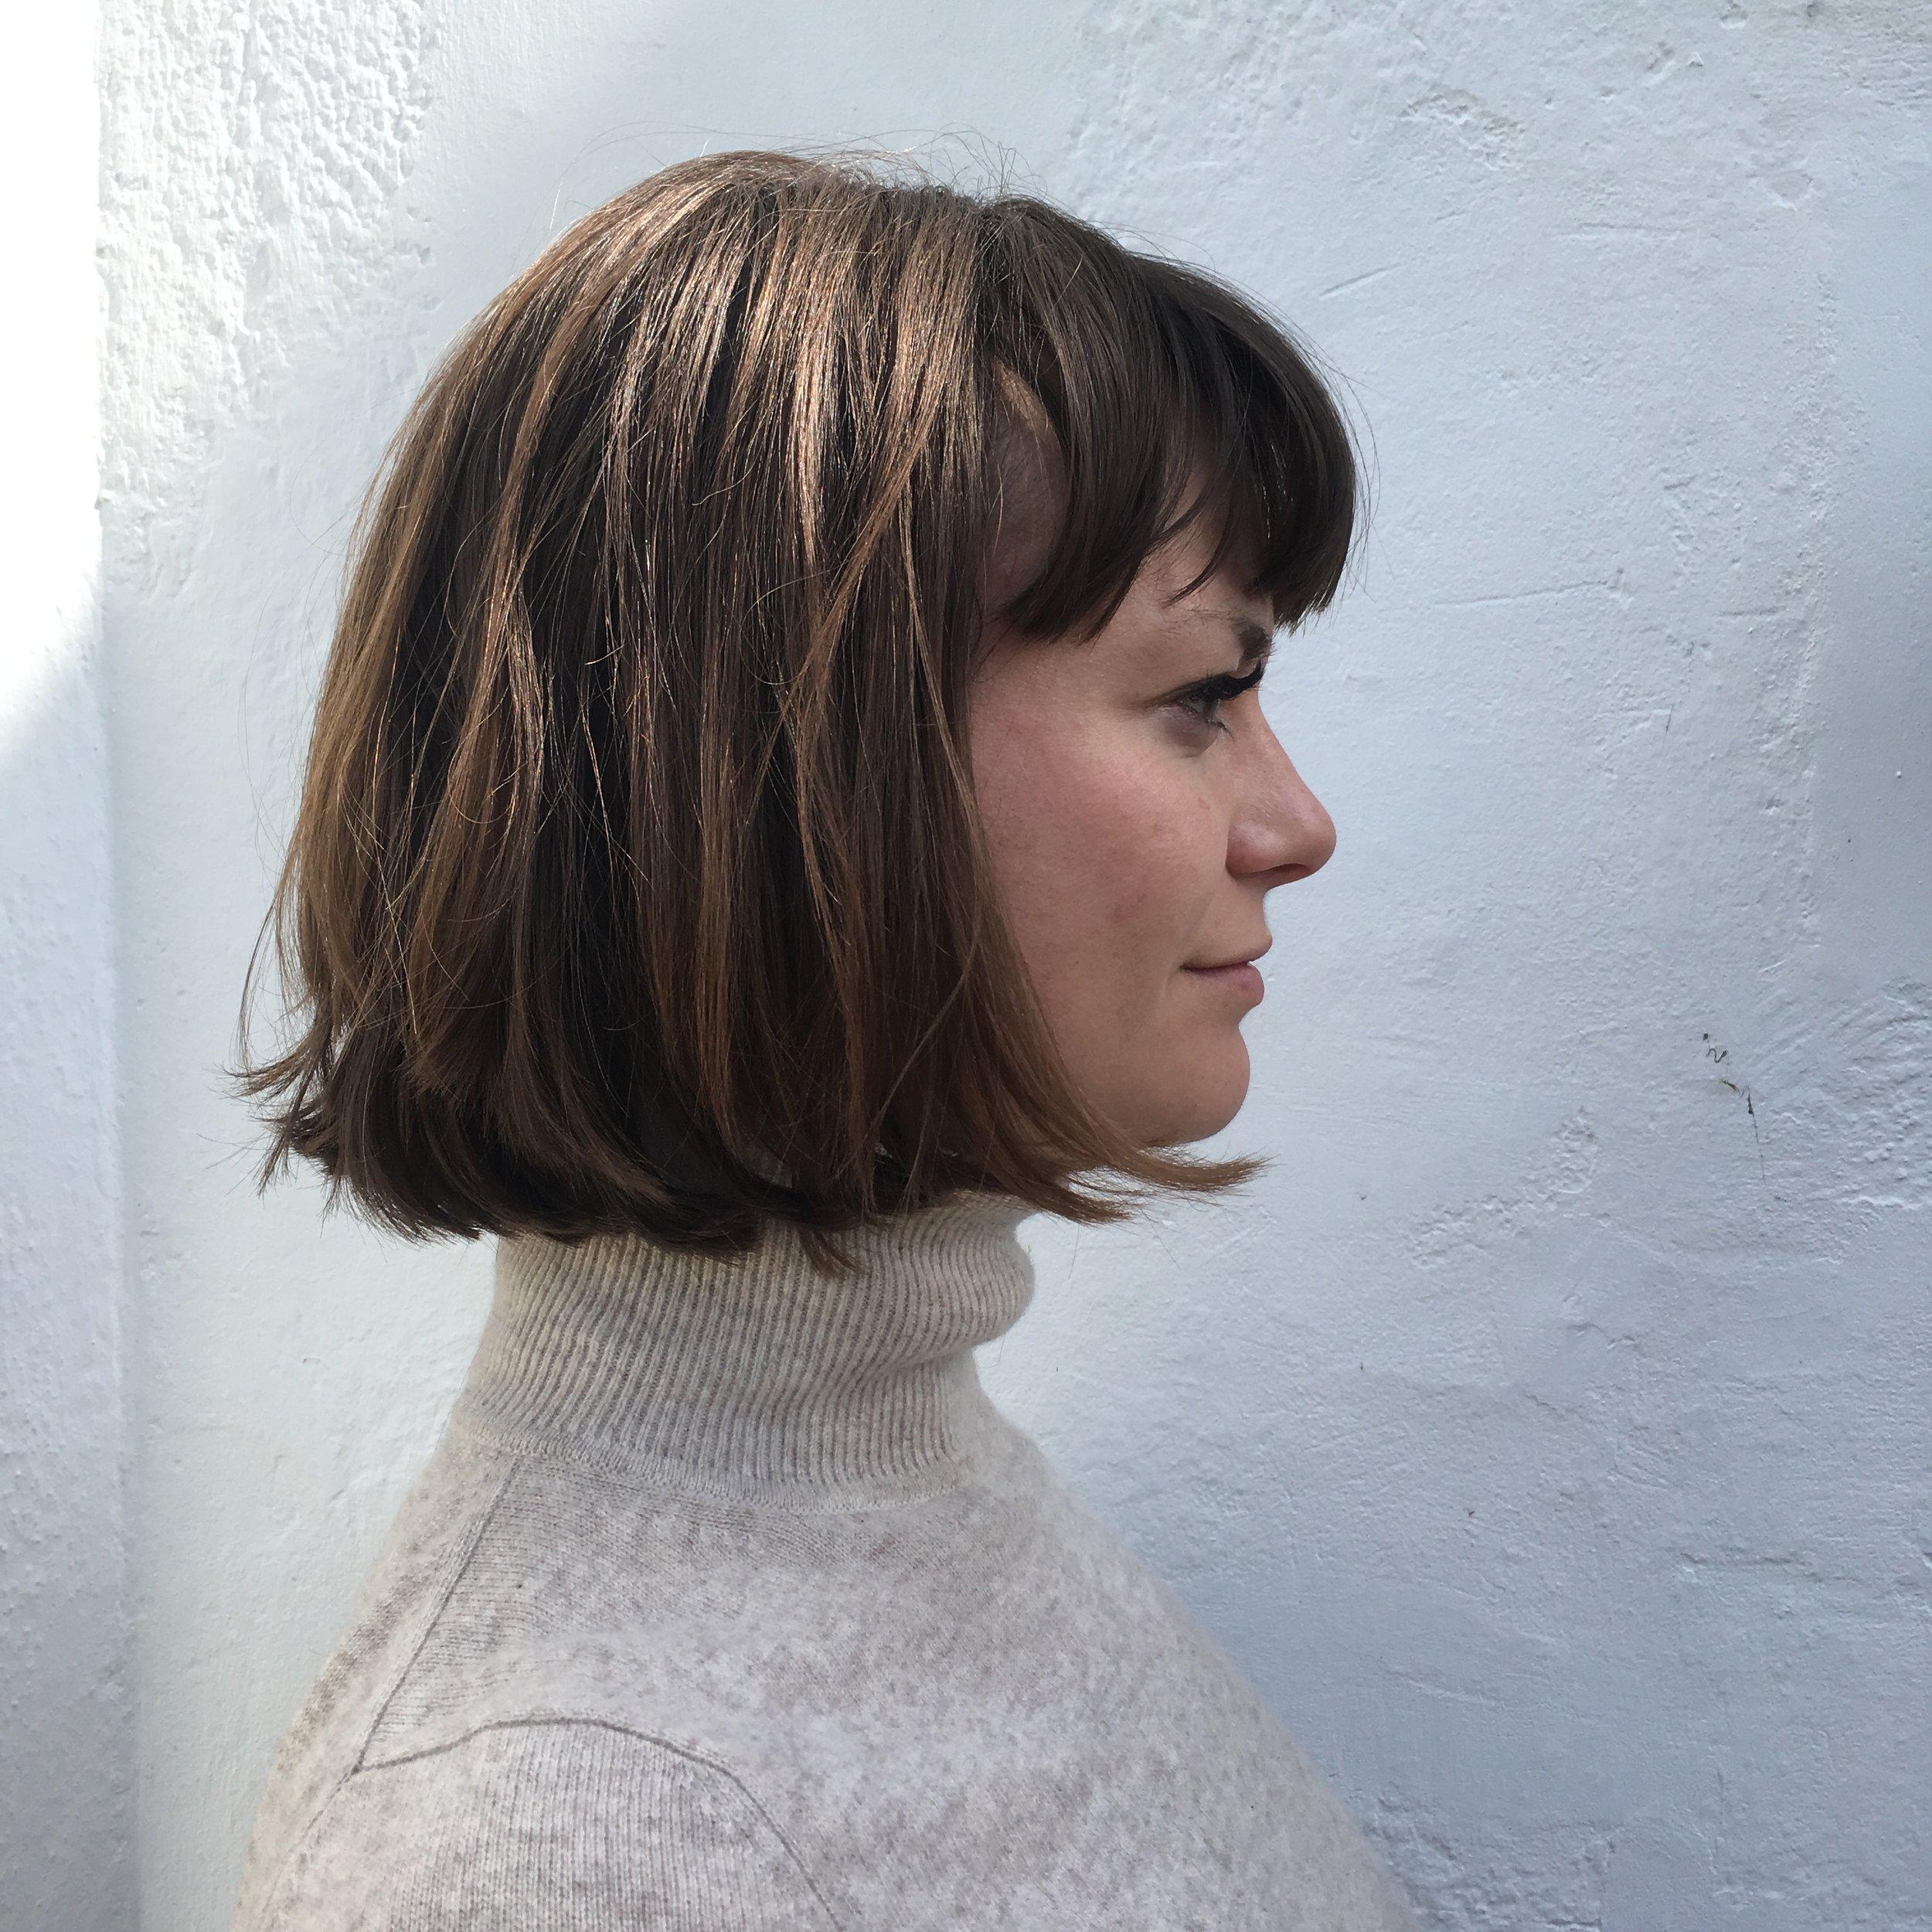 Kassia St Clair. Photo credit: Olivier Vidal